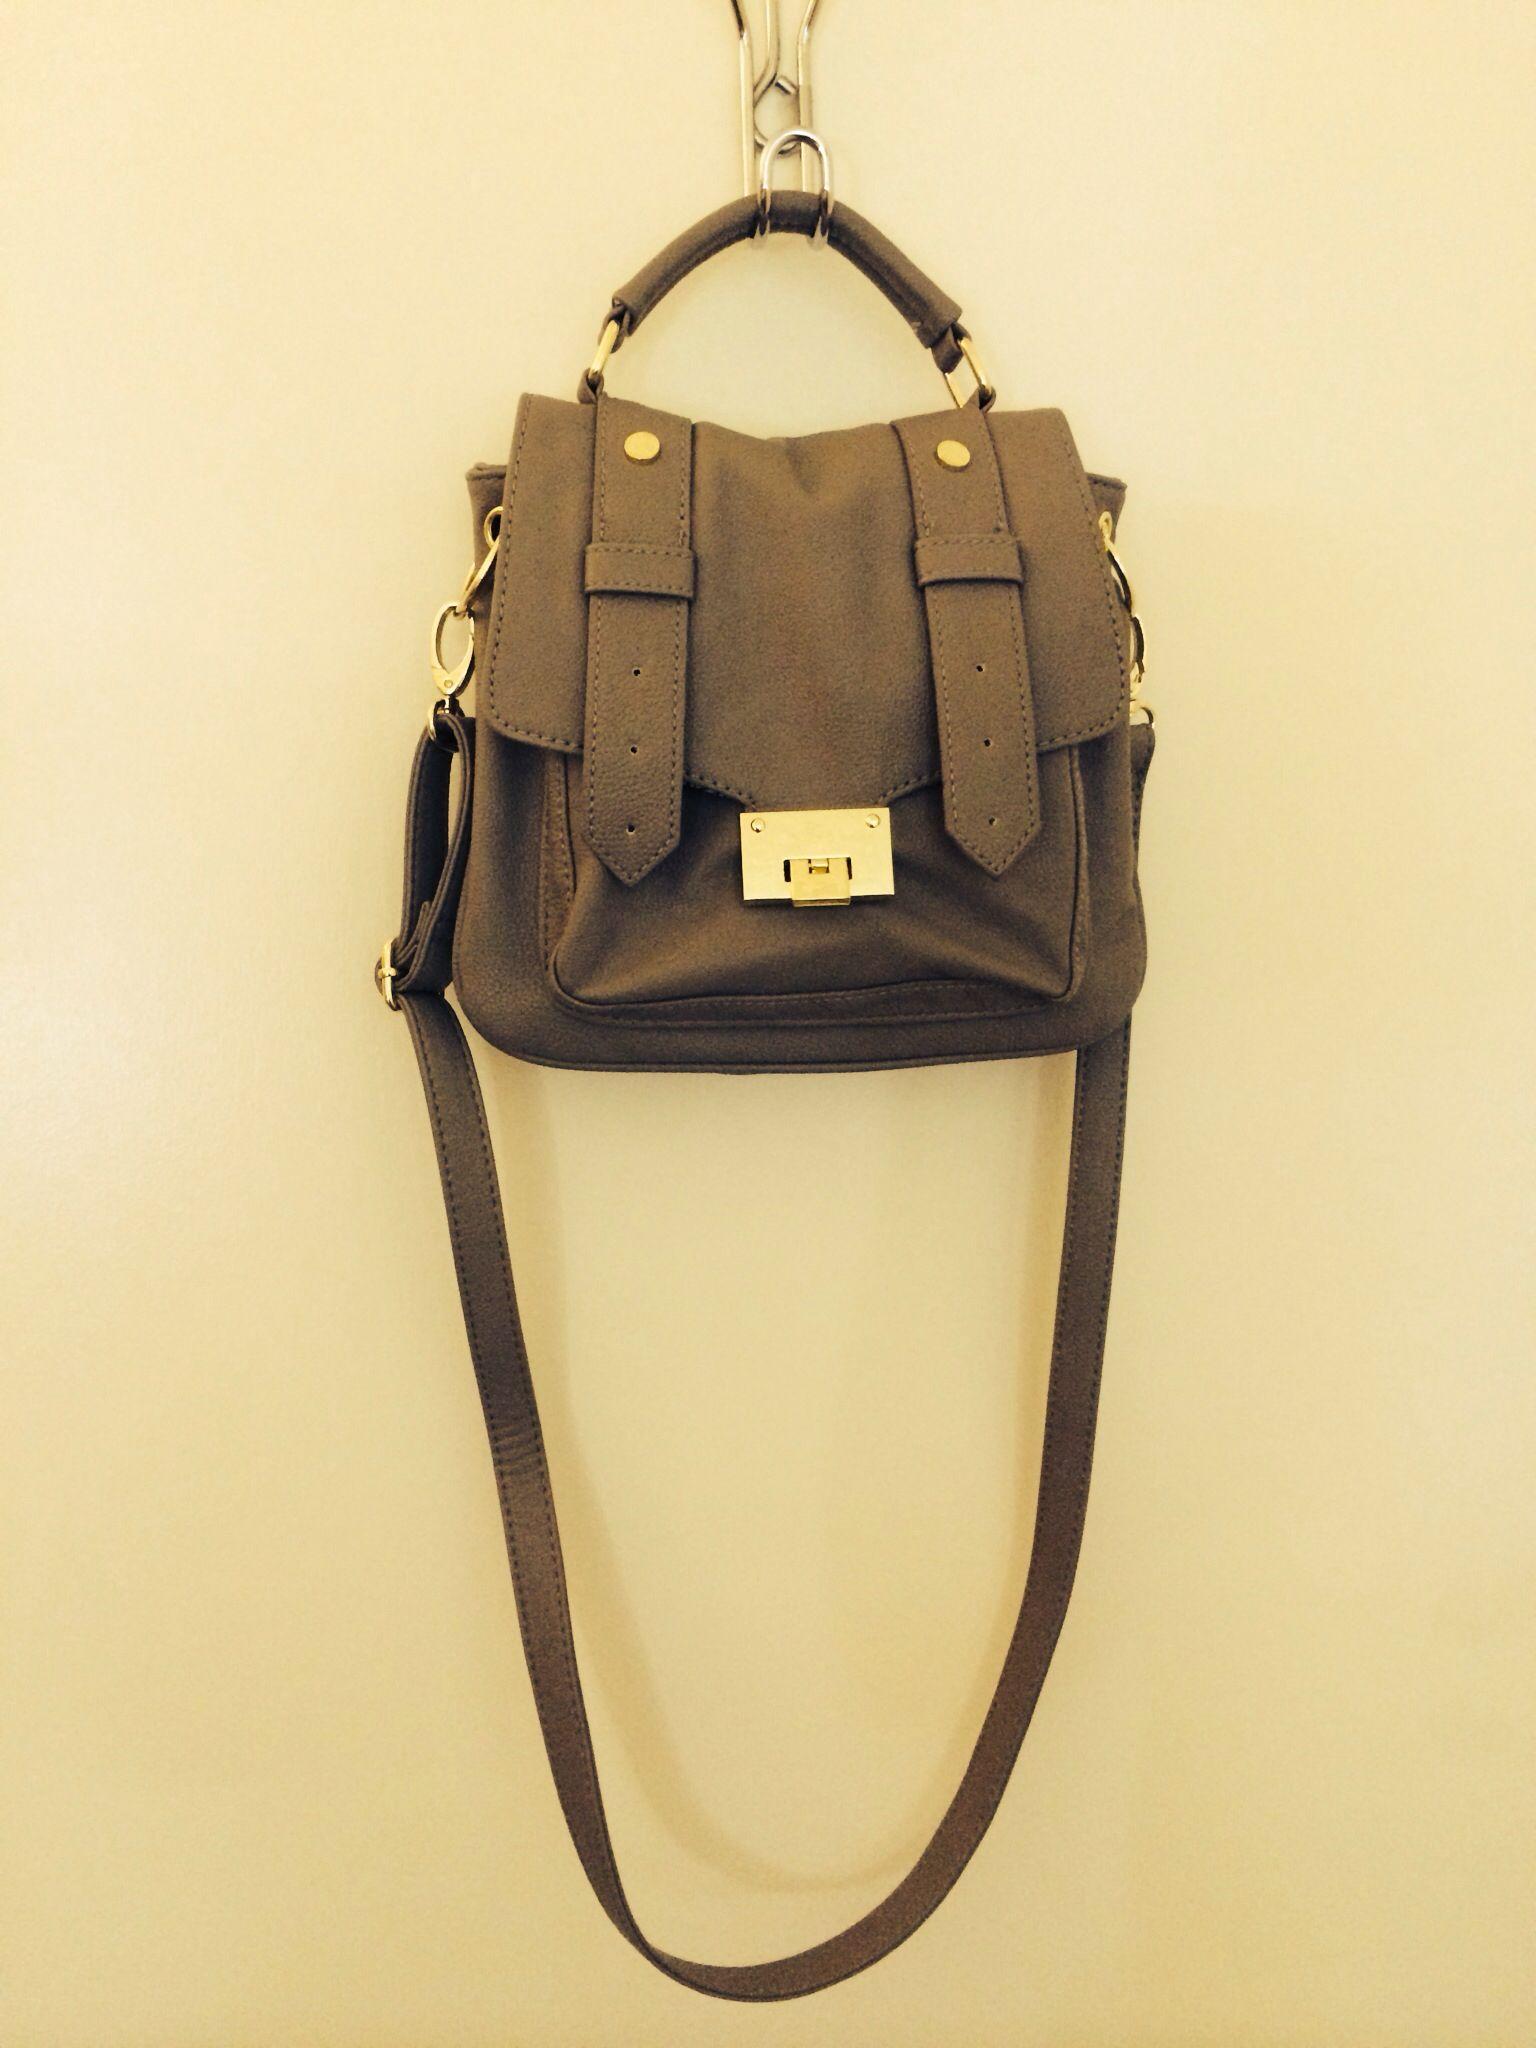 Loving my new Steve Madden bag TJ Maxx, Marshall's, Ross